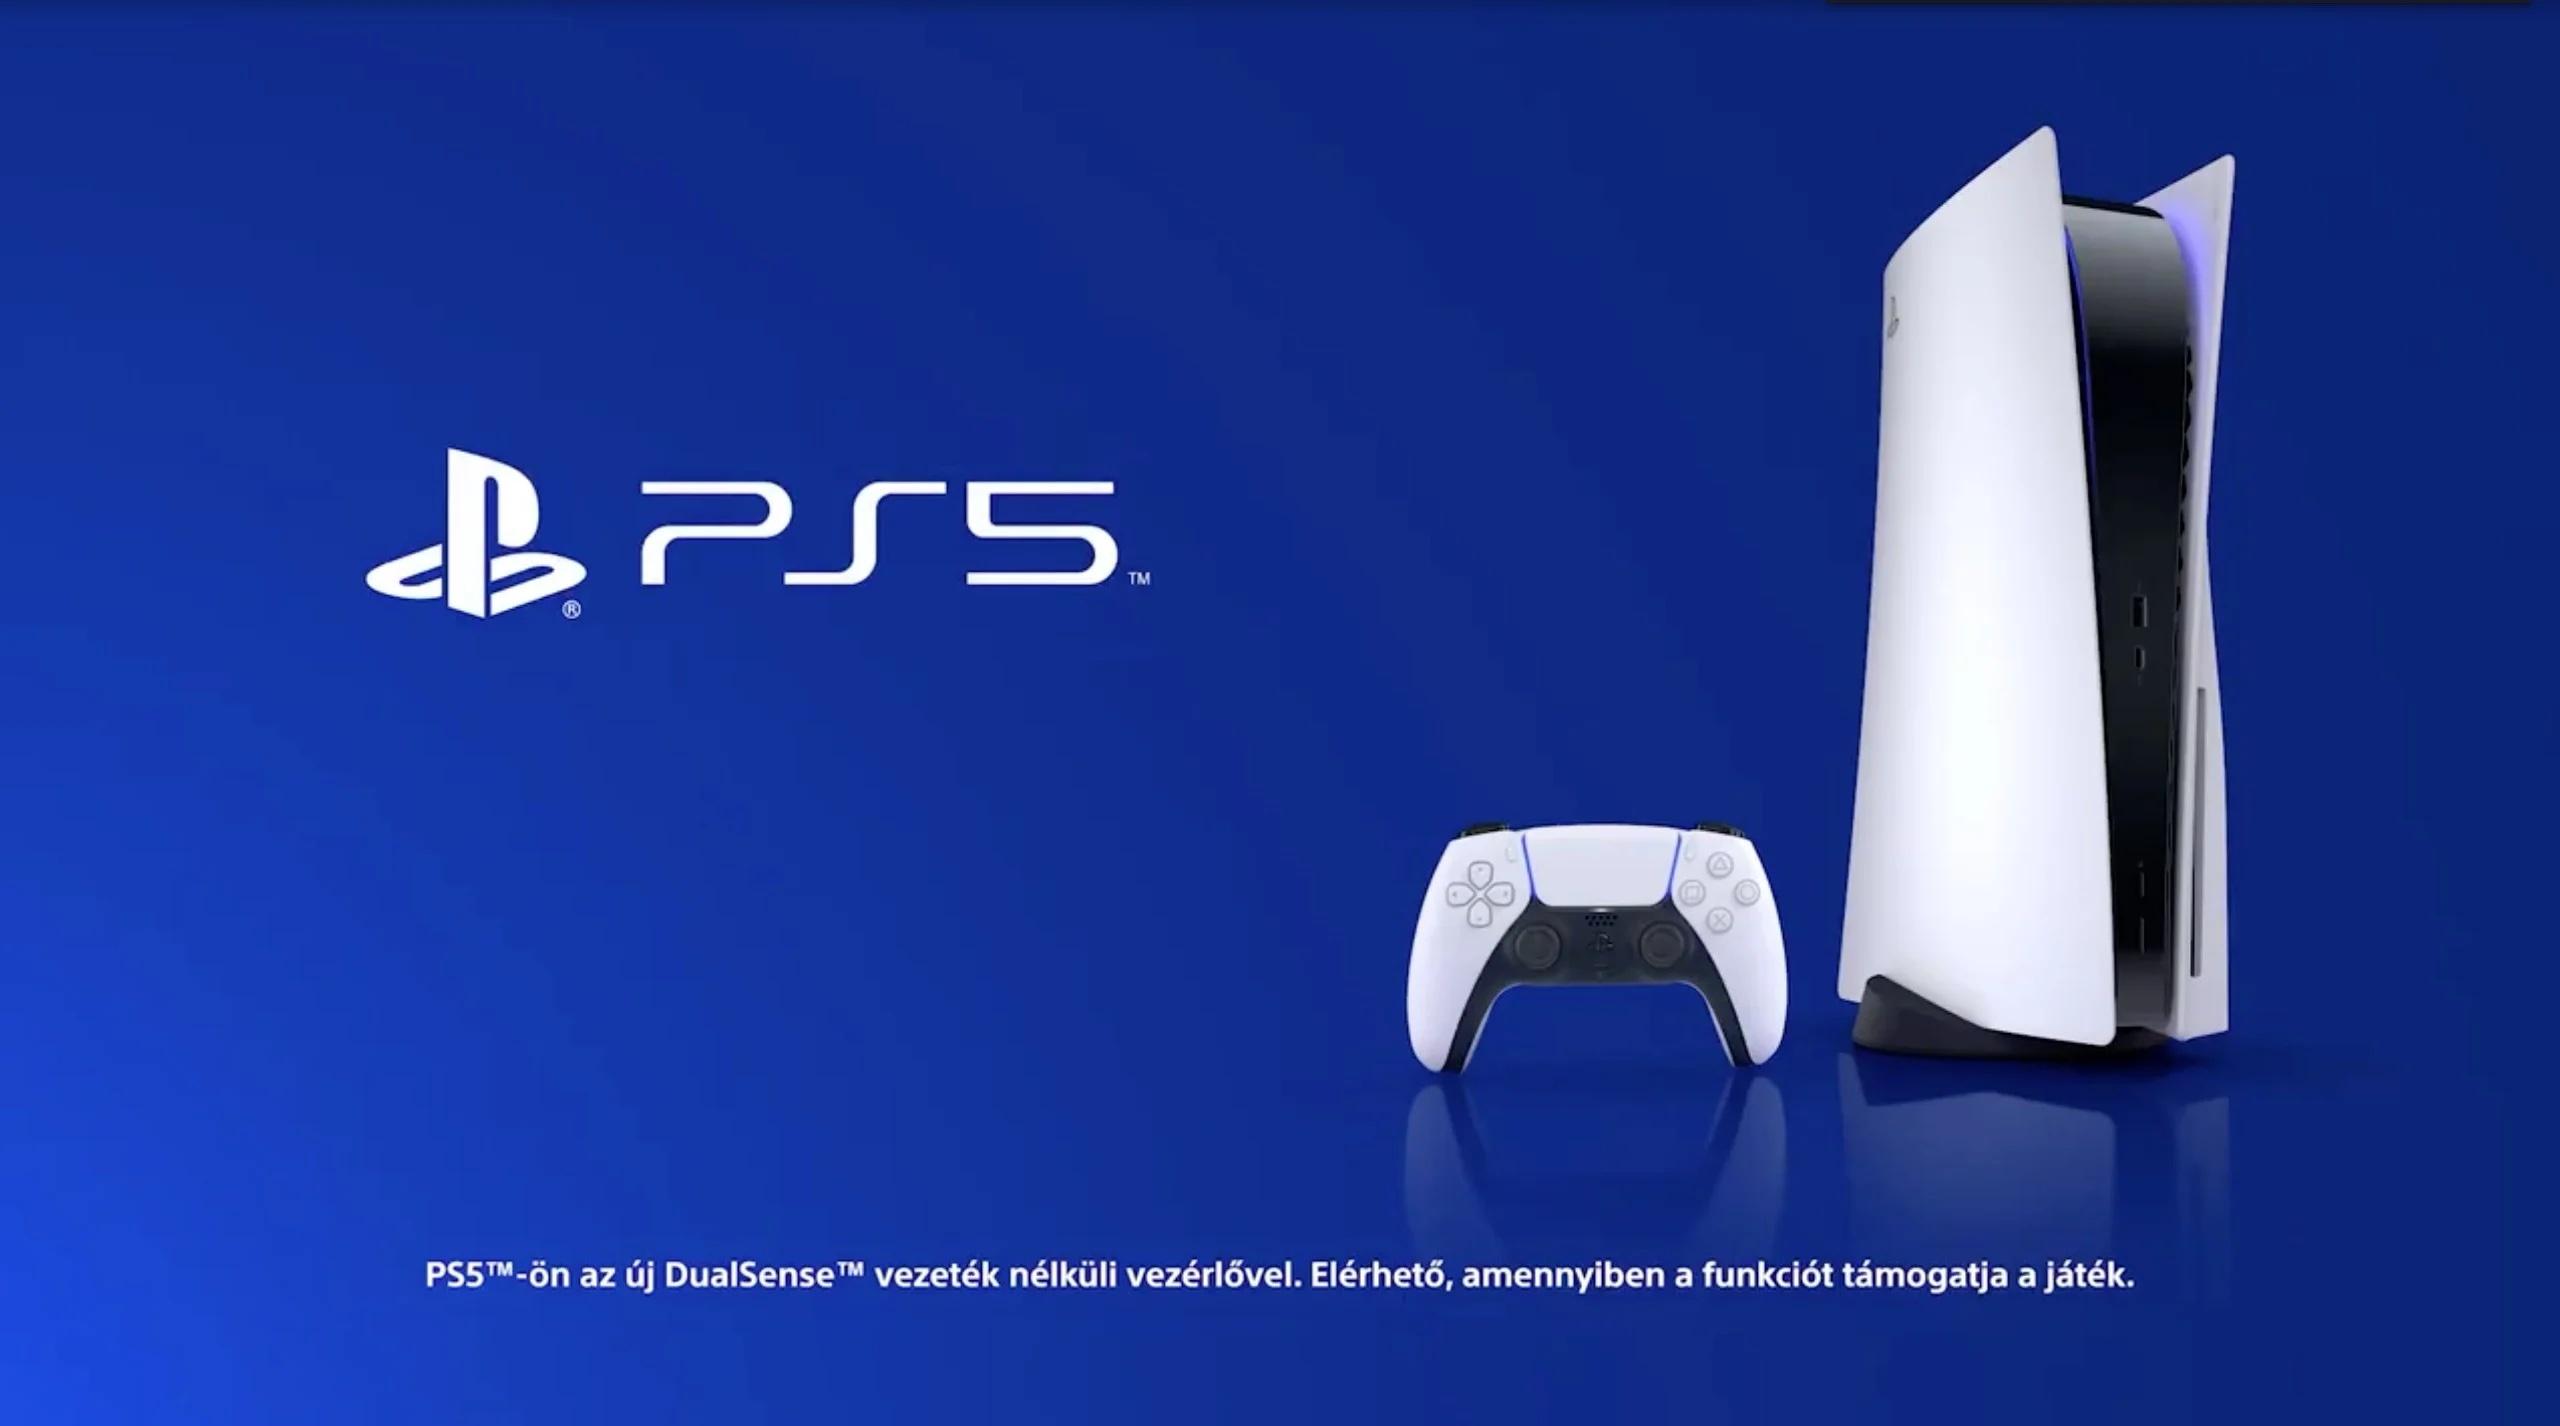 PlayStation 5 güncellemesine